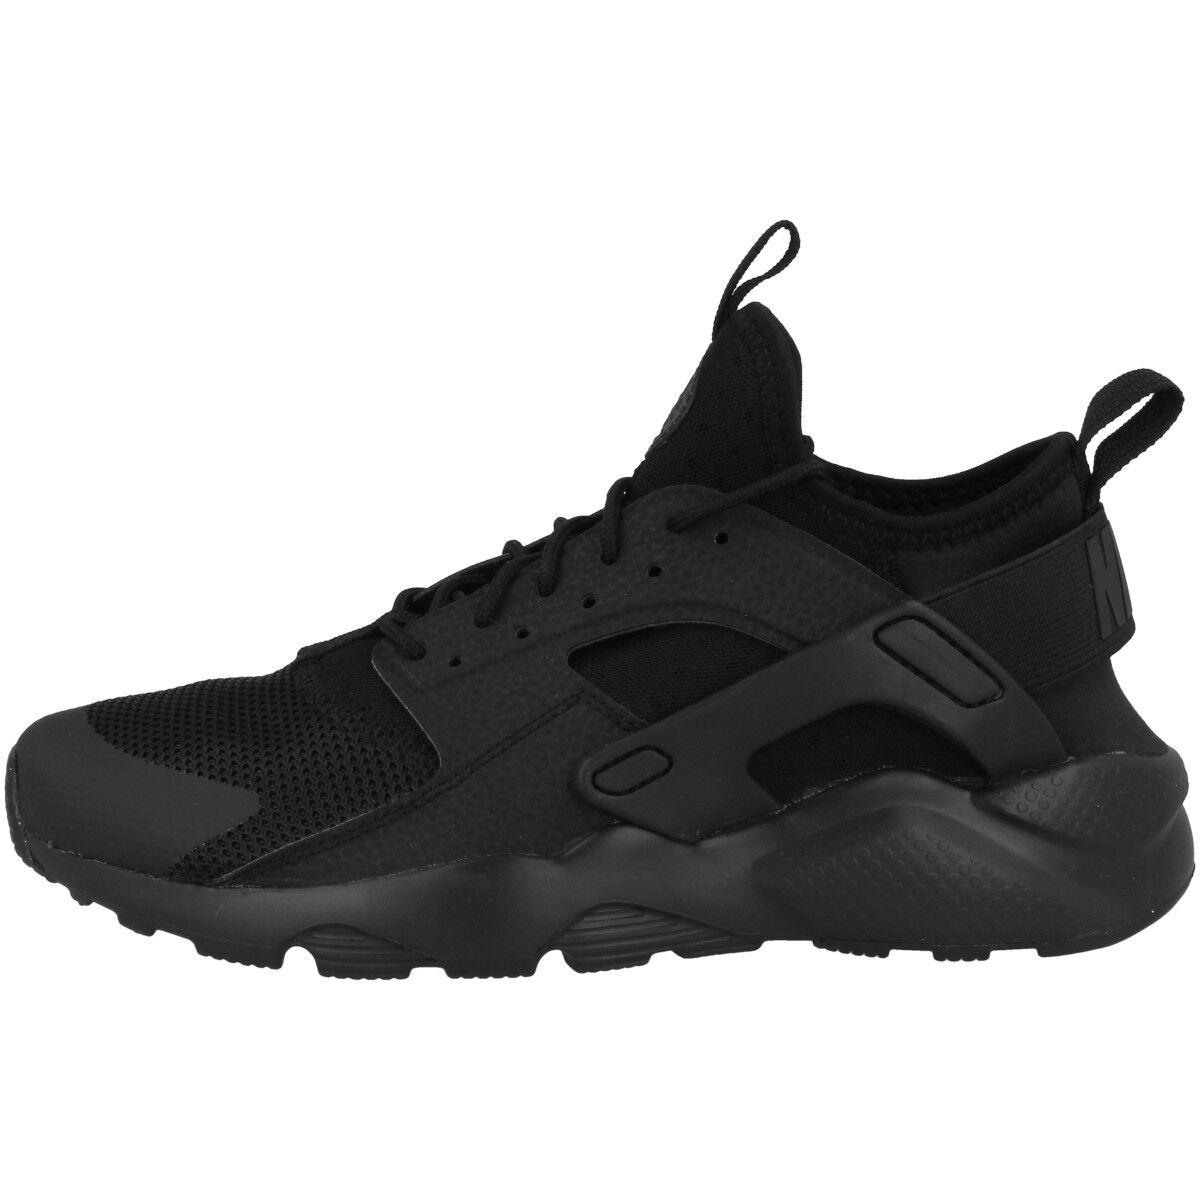 Nike Air Huarache Correr Ultra Gs Deportivas Zapatos Ocio Deporte Zapatillas Deportivas Gs db5dee